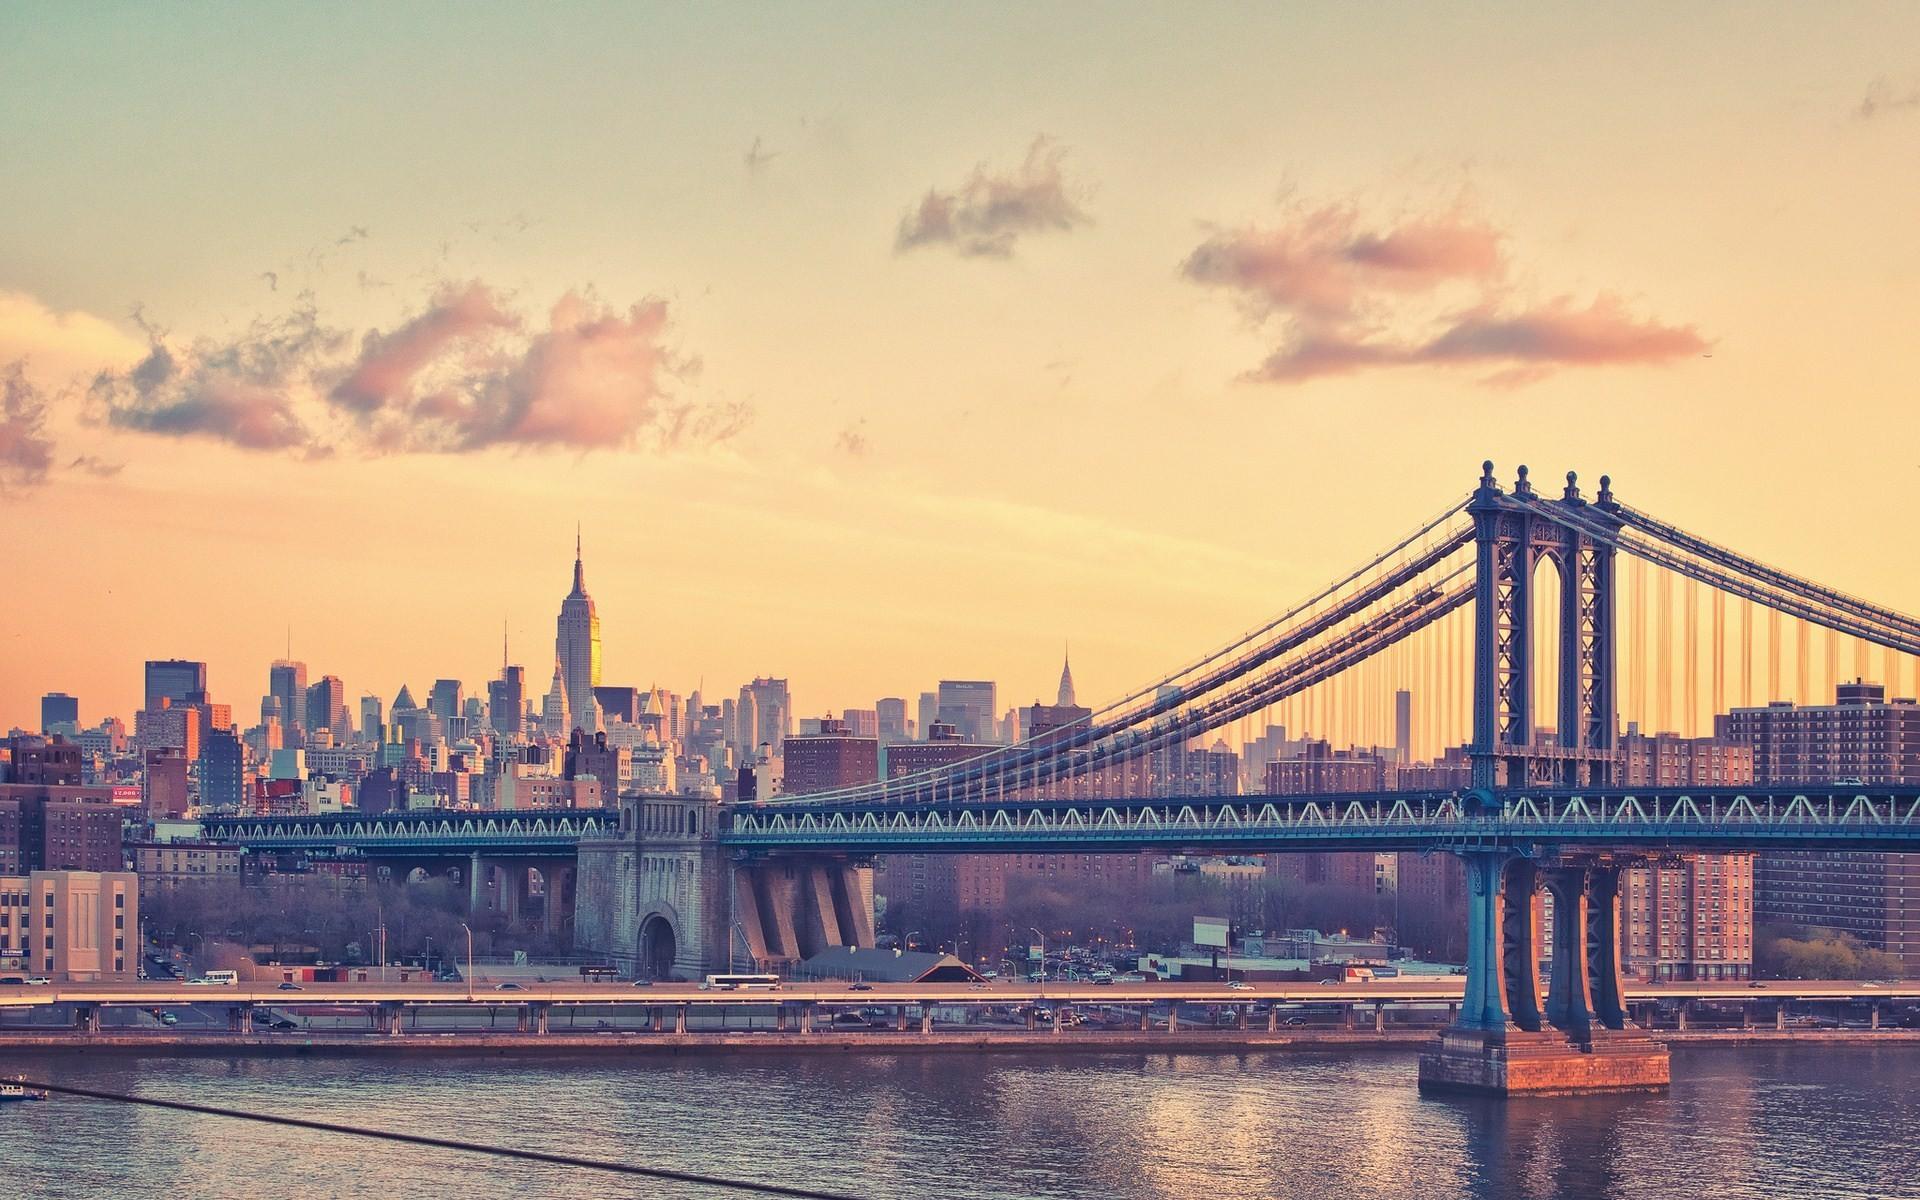 … new-york-city-manhattan-bridge-photography-wallpaper-1920×1200